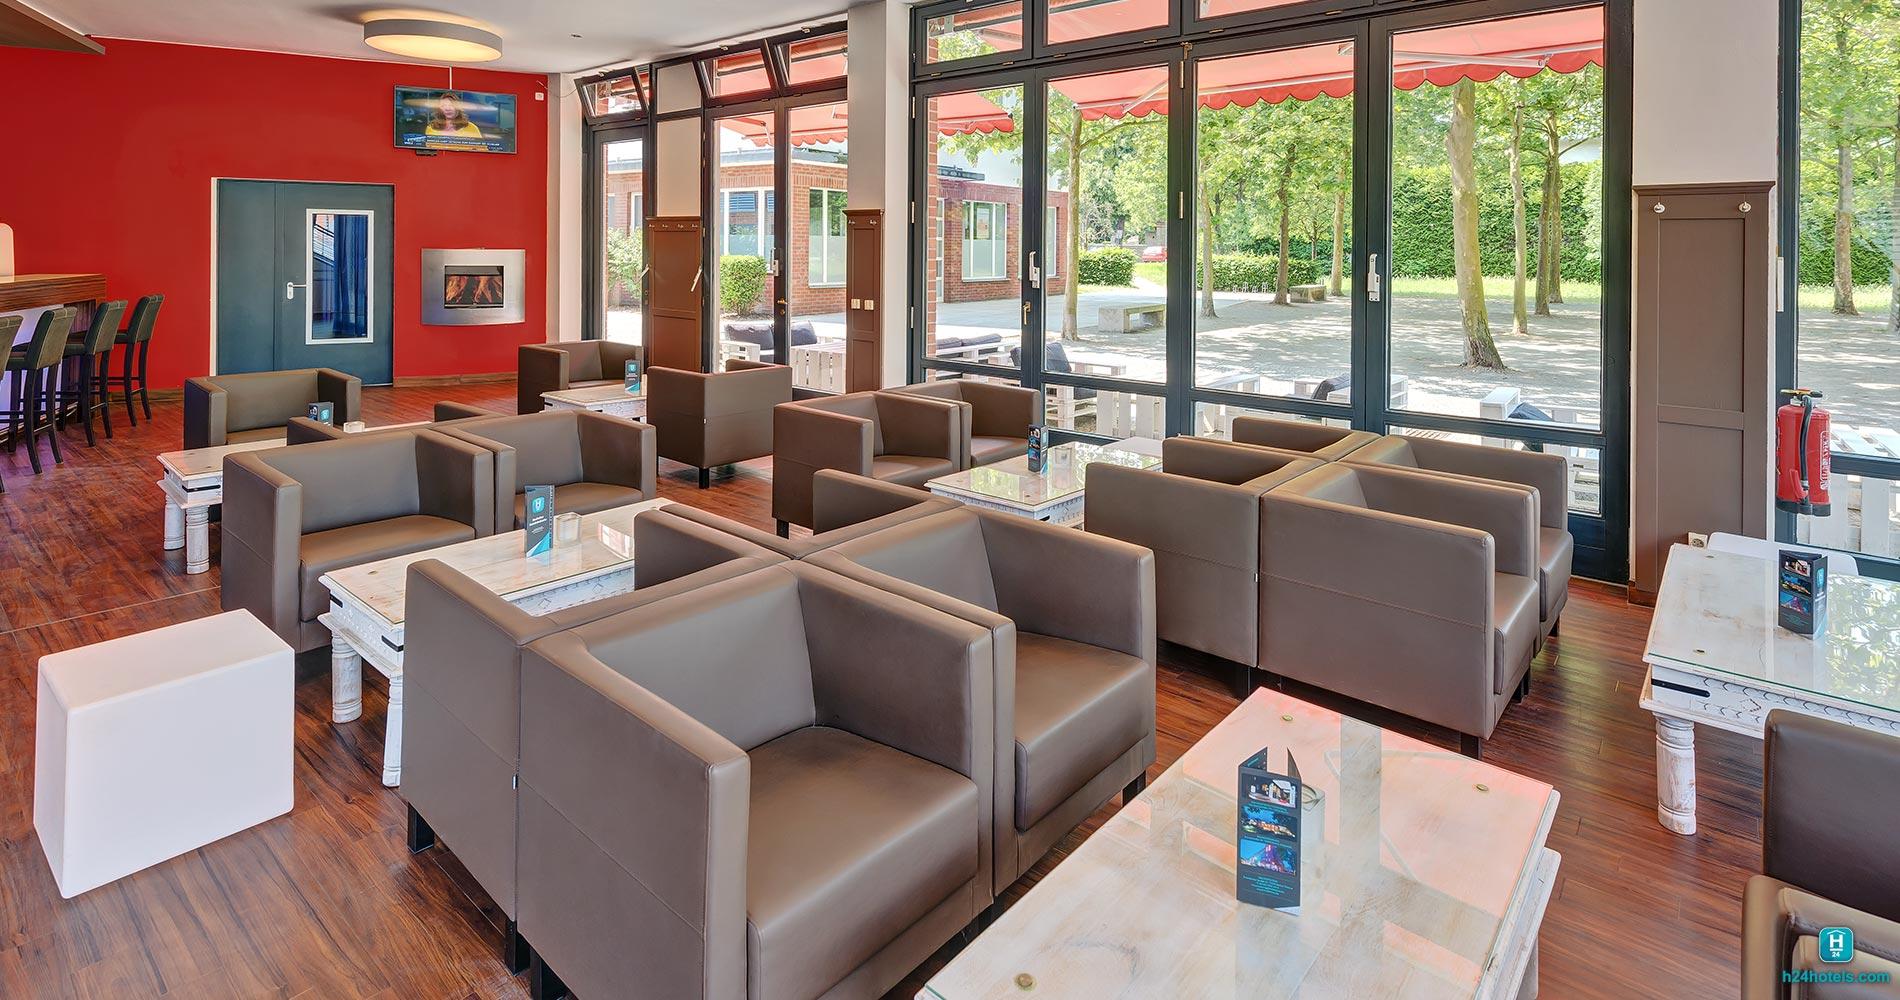 H24 Hoteltow Sitzecke, Lounge